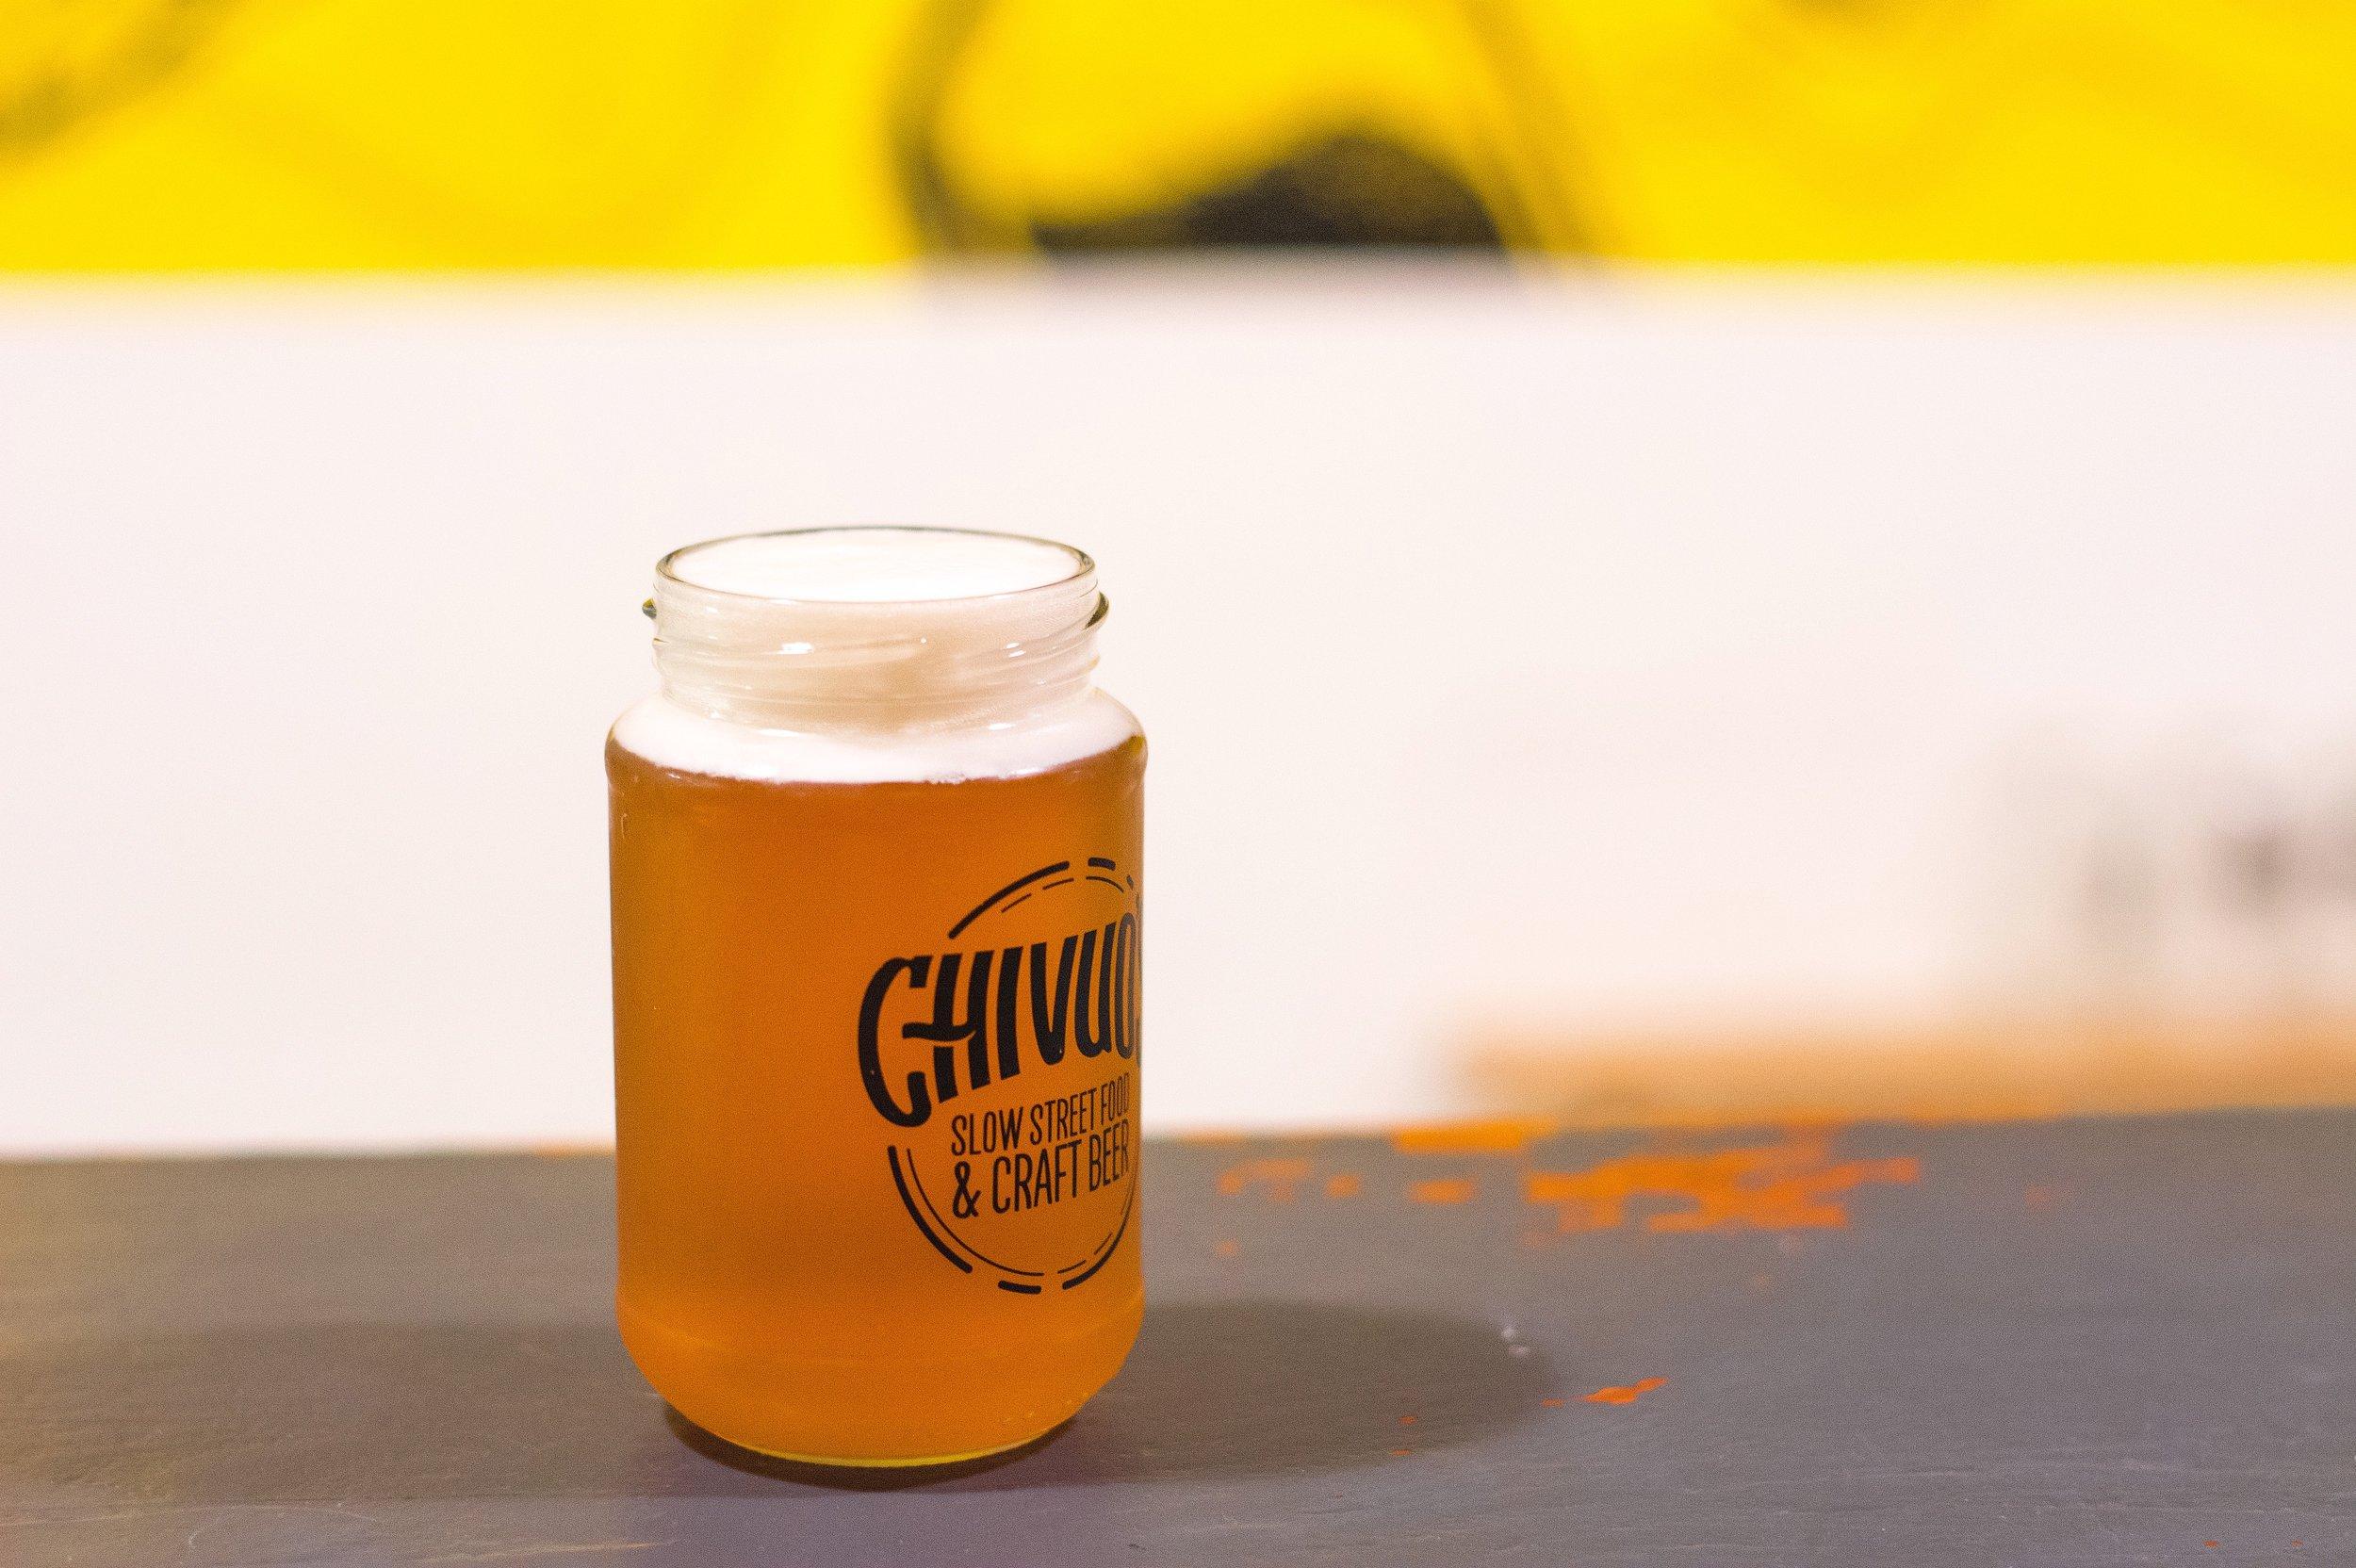 Chivuos - Photo © Øhm Sweet Øhm